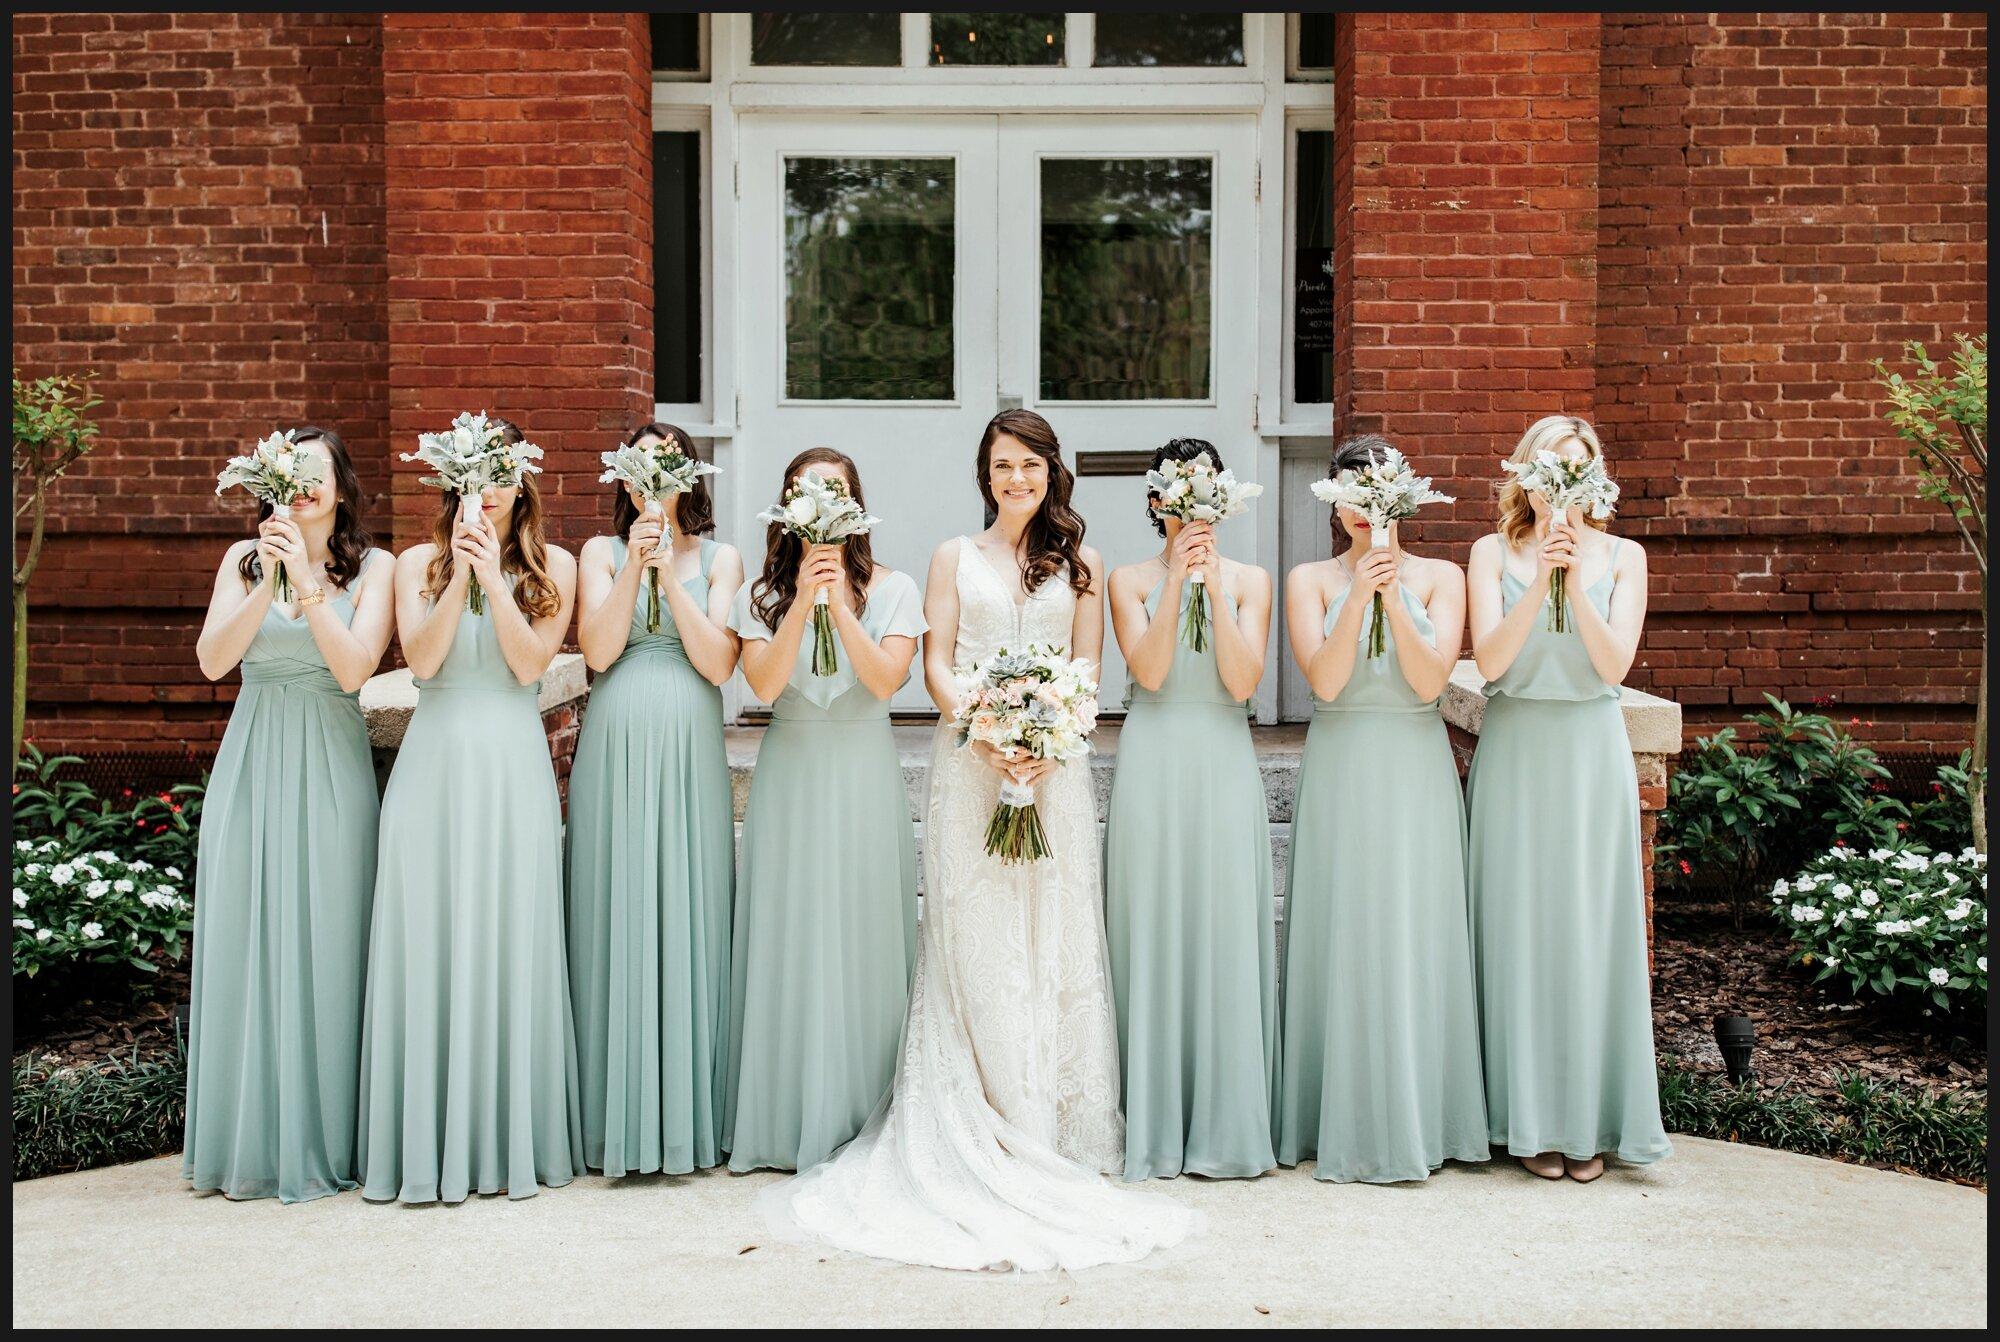 Orlando-Wedding-Photographer-destination-wedding-photographer-florida-wedding-photographer-hawaii-wedding-photographer_0659.jpg